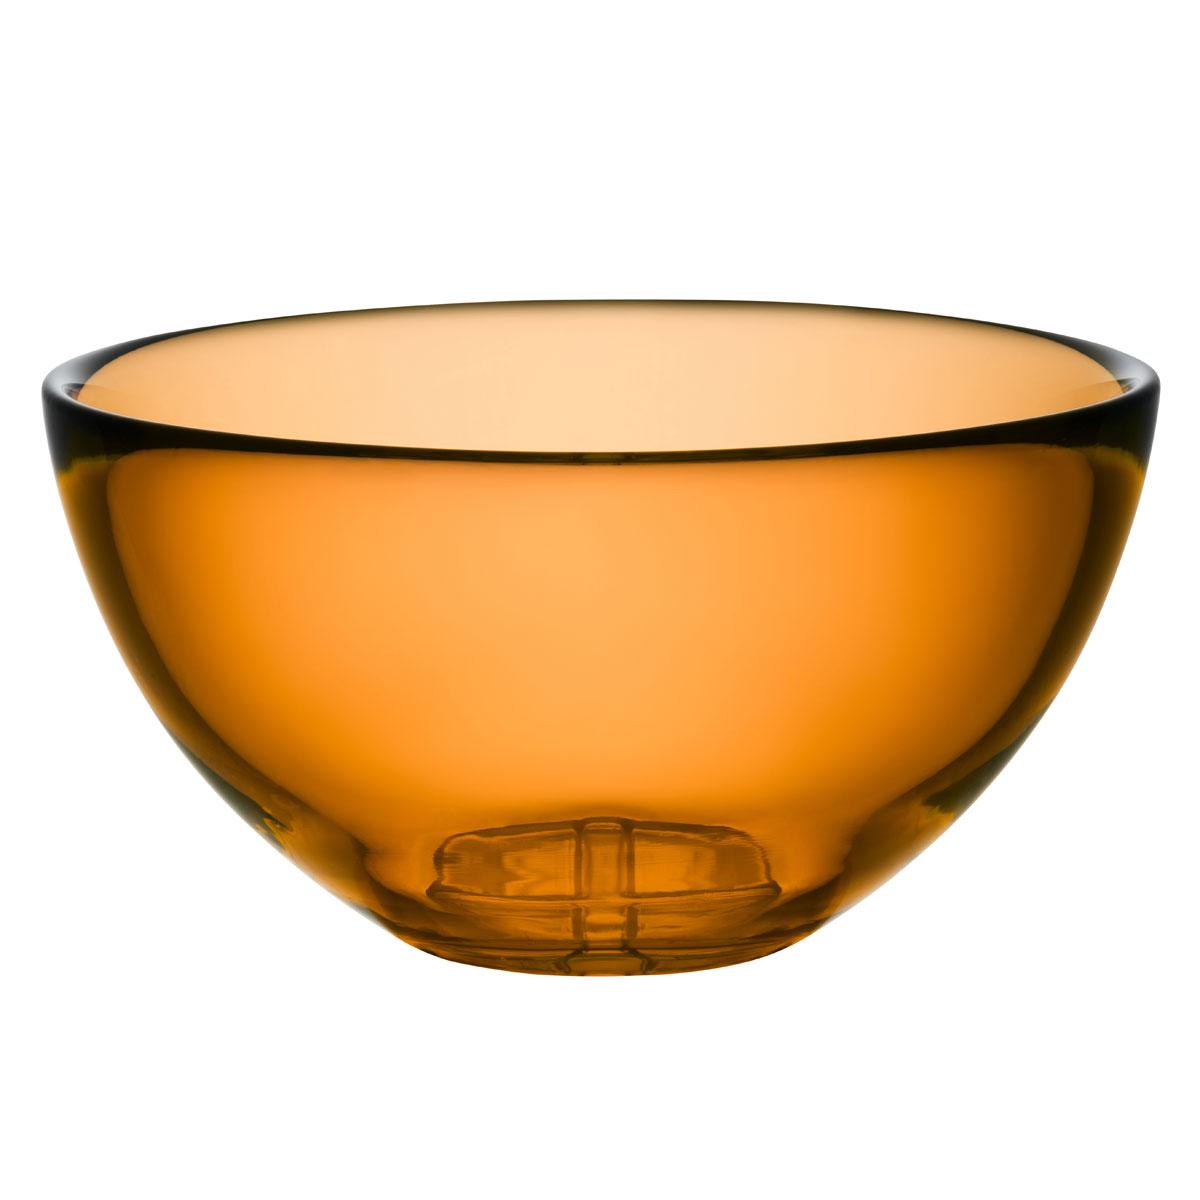 Kosta Boda Bruk Crystal Large Serving Bowl, Amber